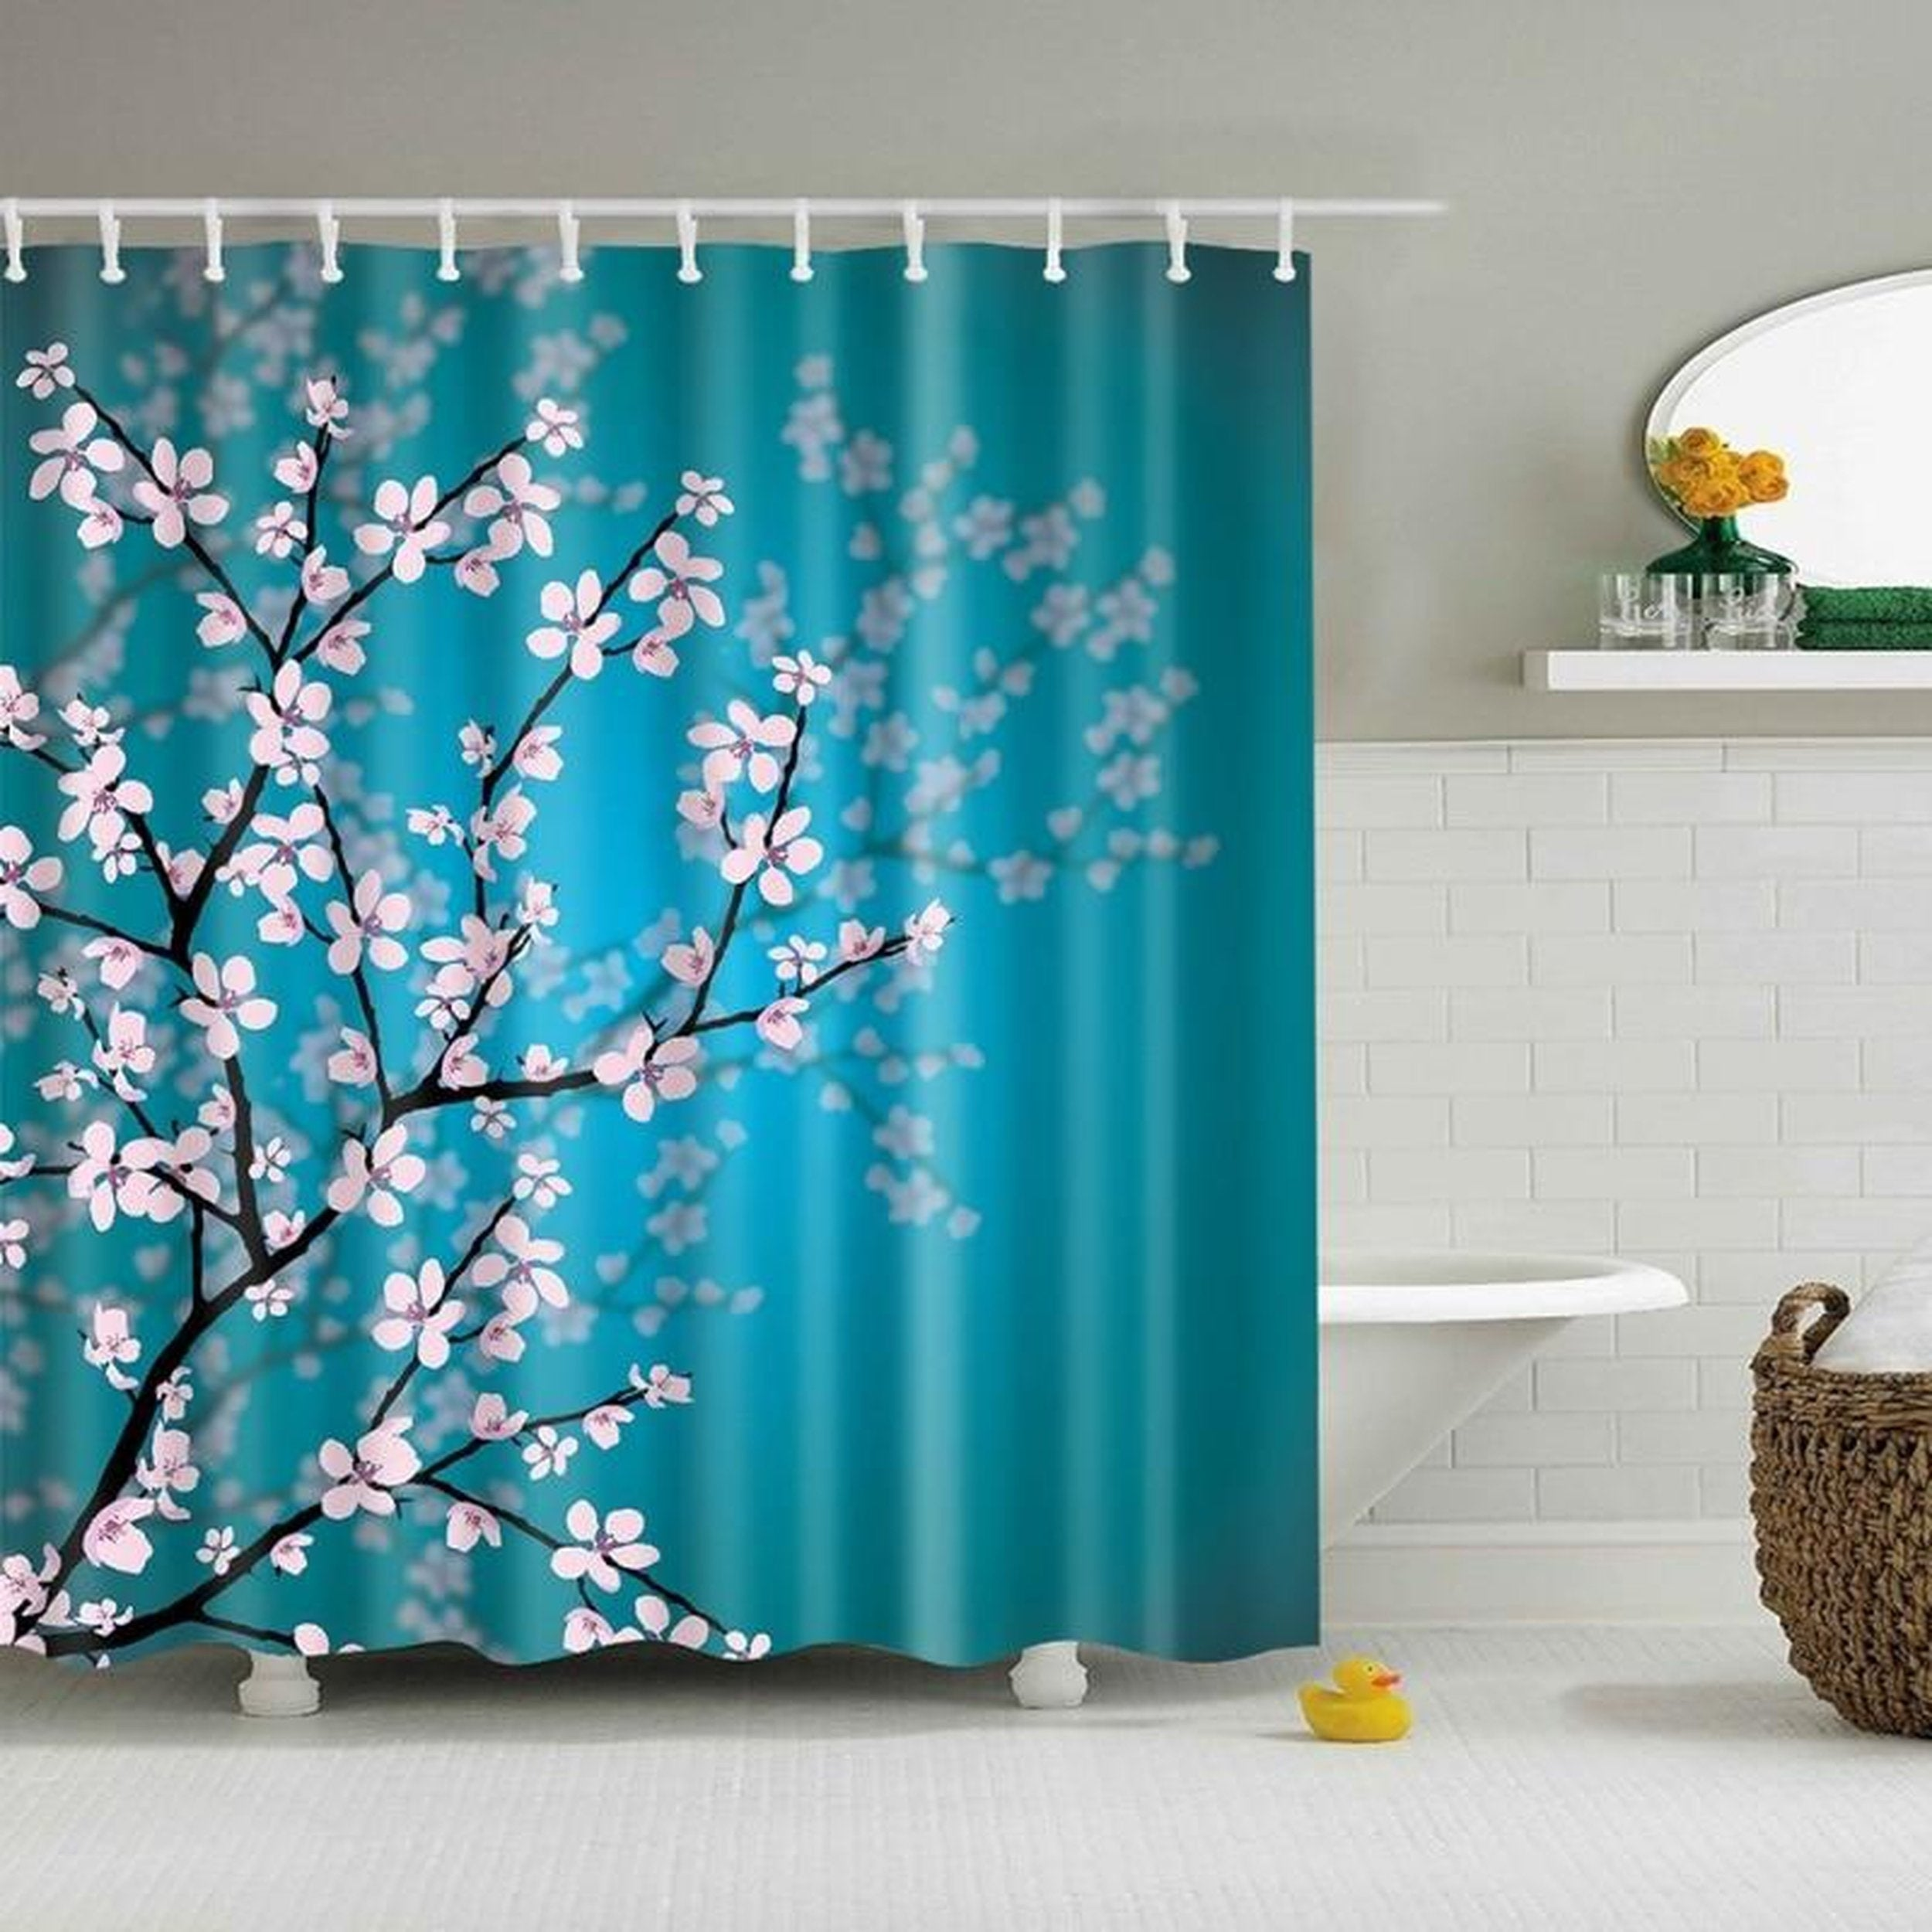 Fabric Bathroom Decor Shower Curtain Pink Blossom